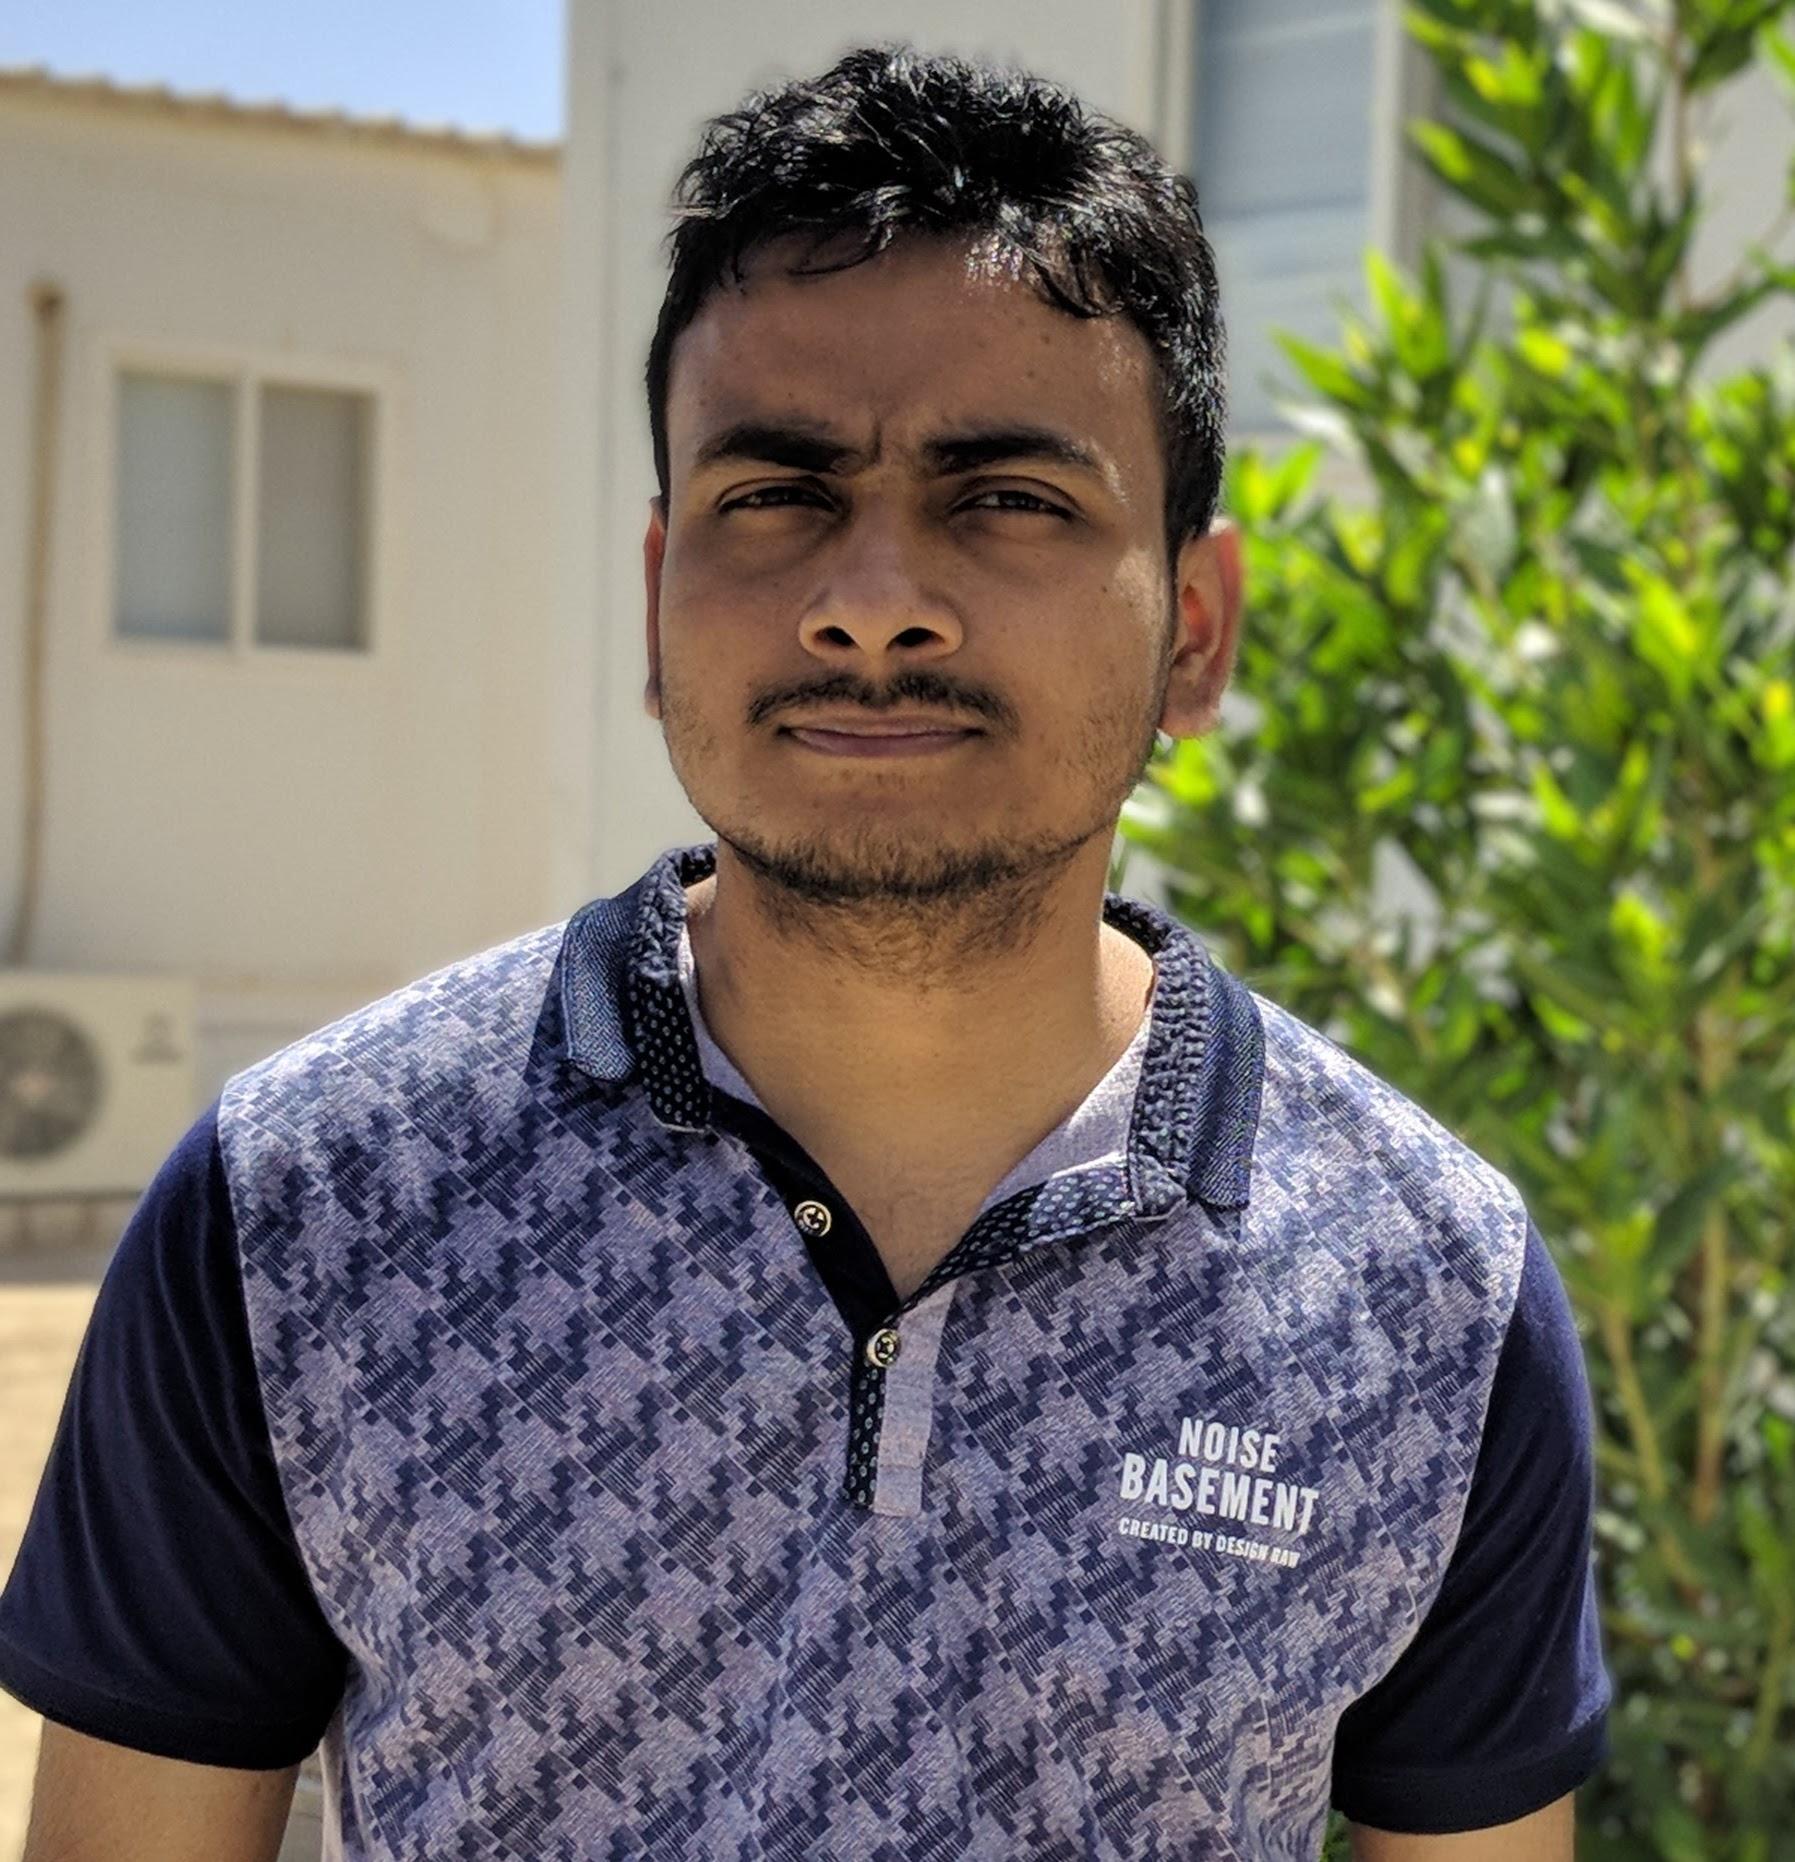 Yukesh Chaudhary Speaks the hard work he did to achieve success